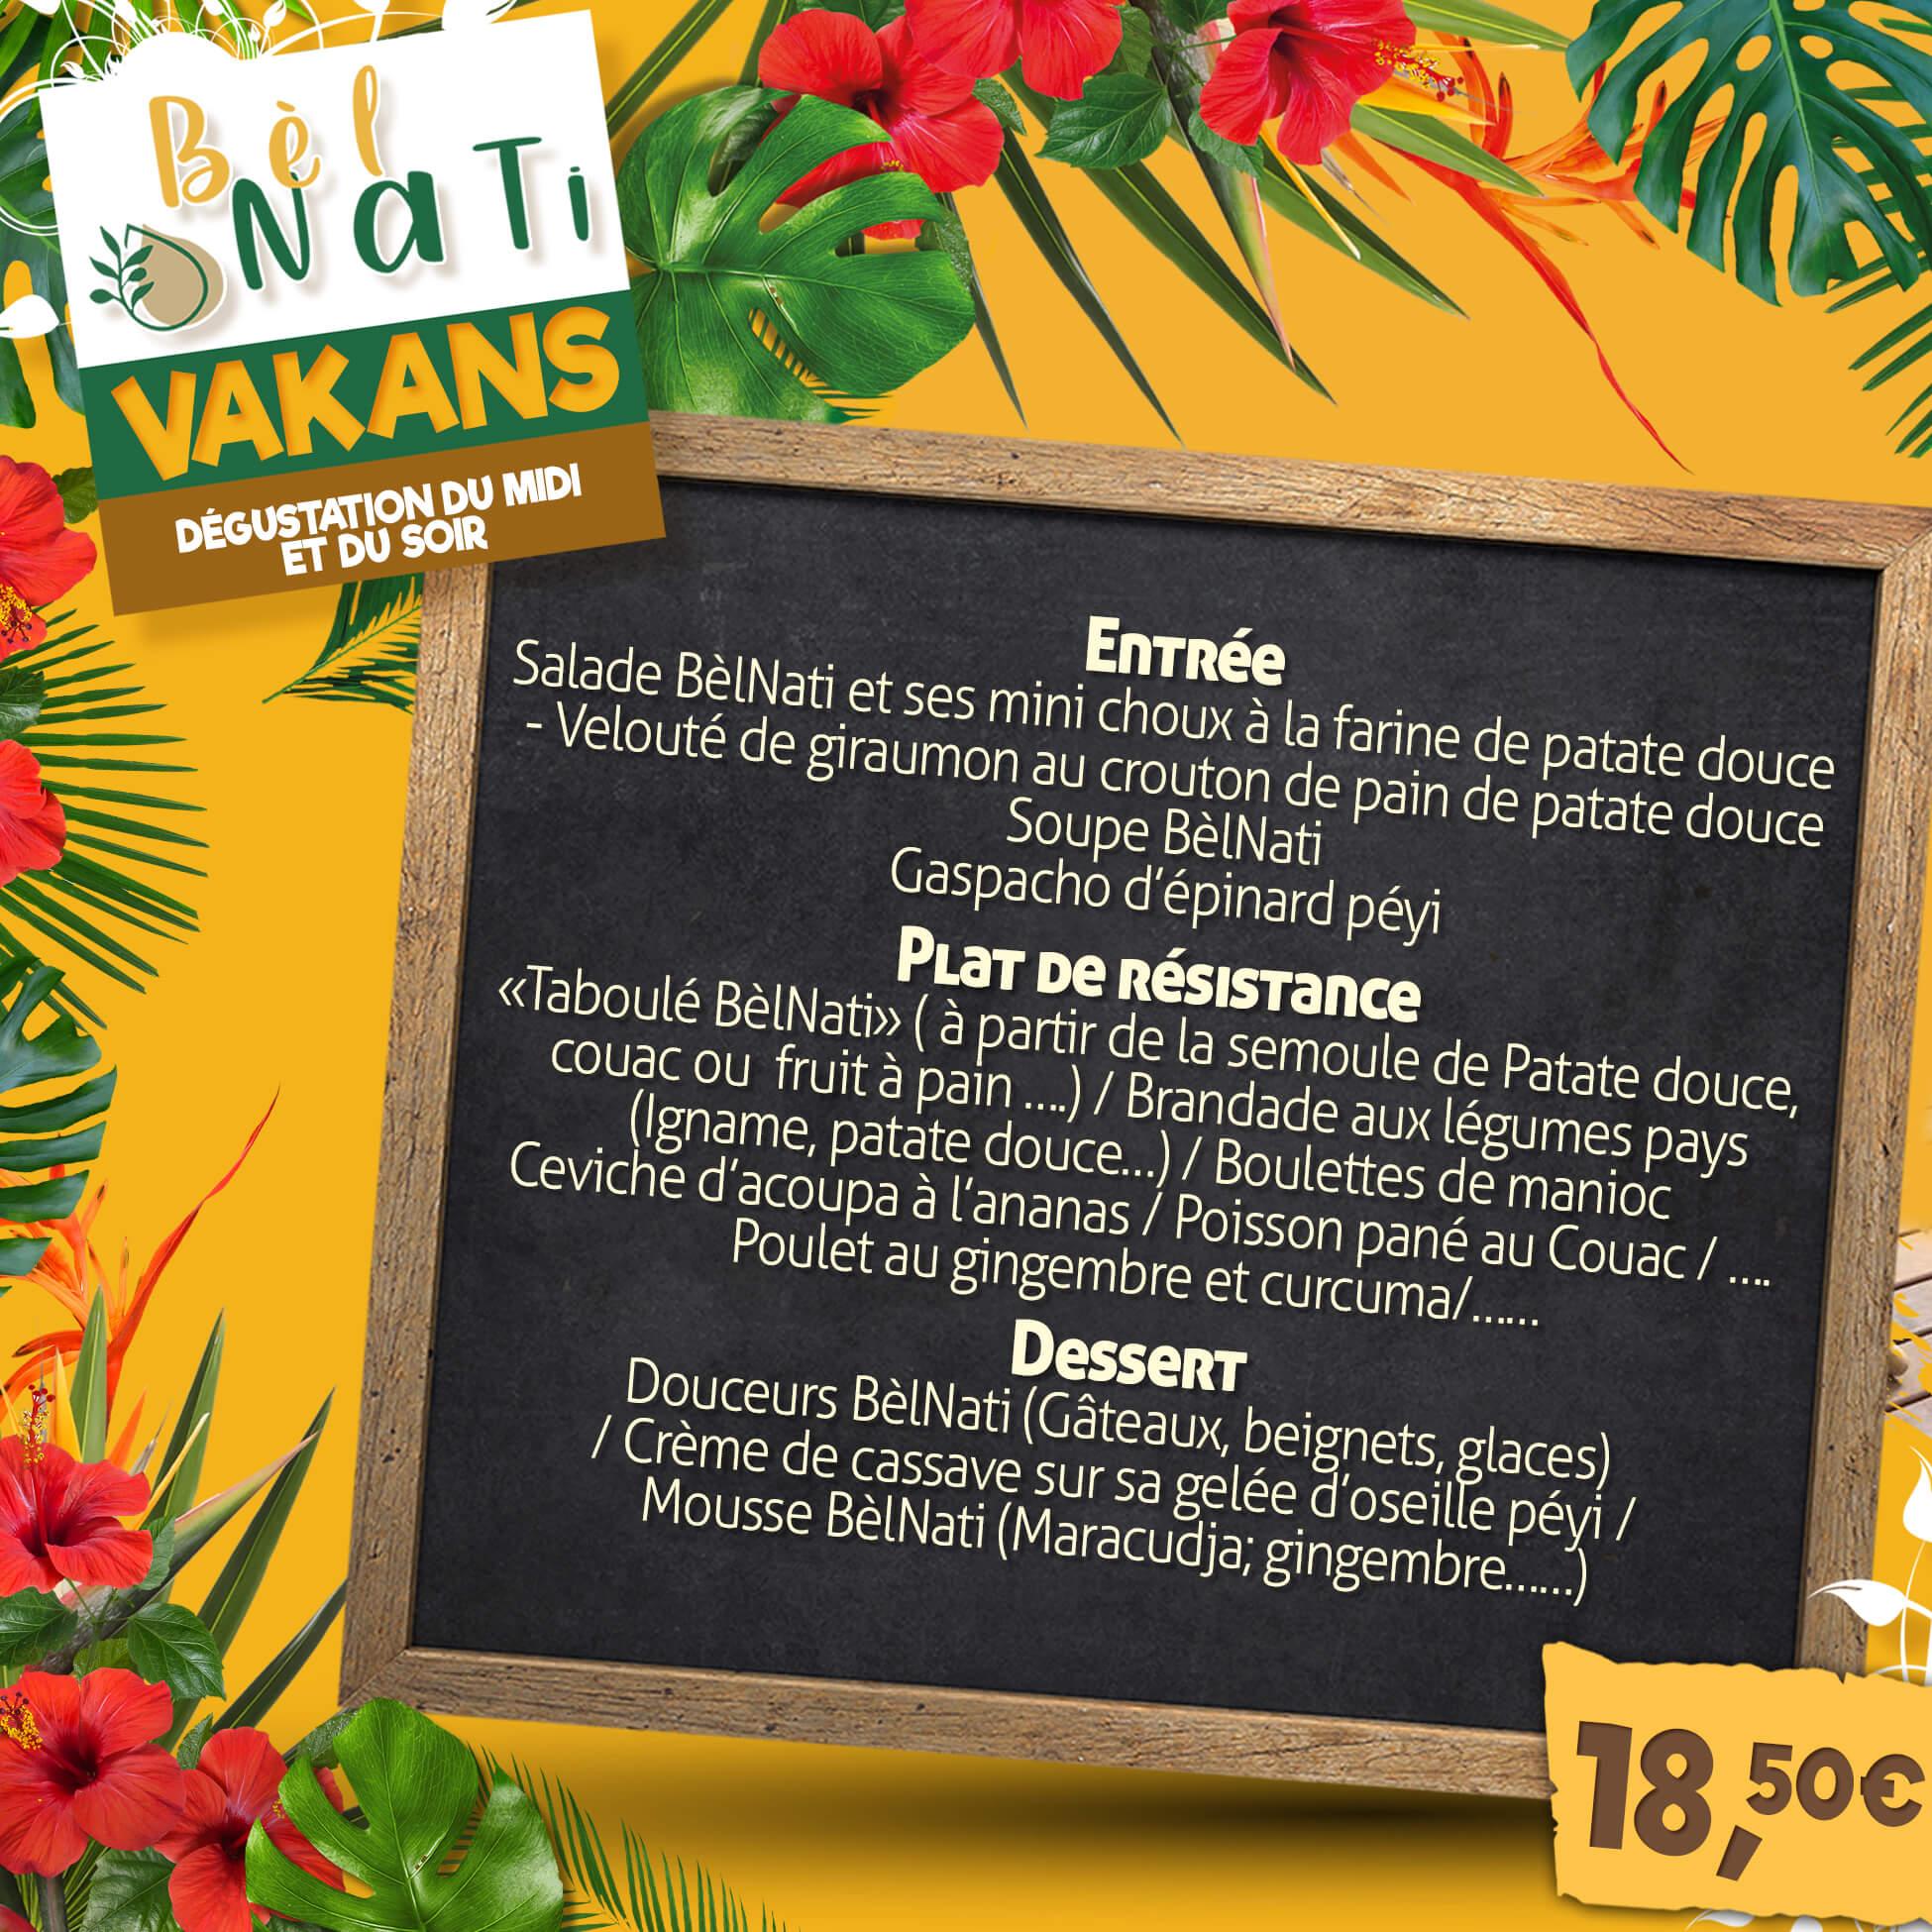 1000×1000-Belnati-vacans–degustation-midi-et-soir (1)